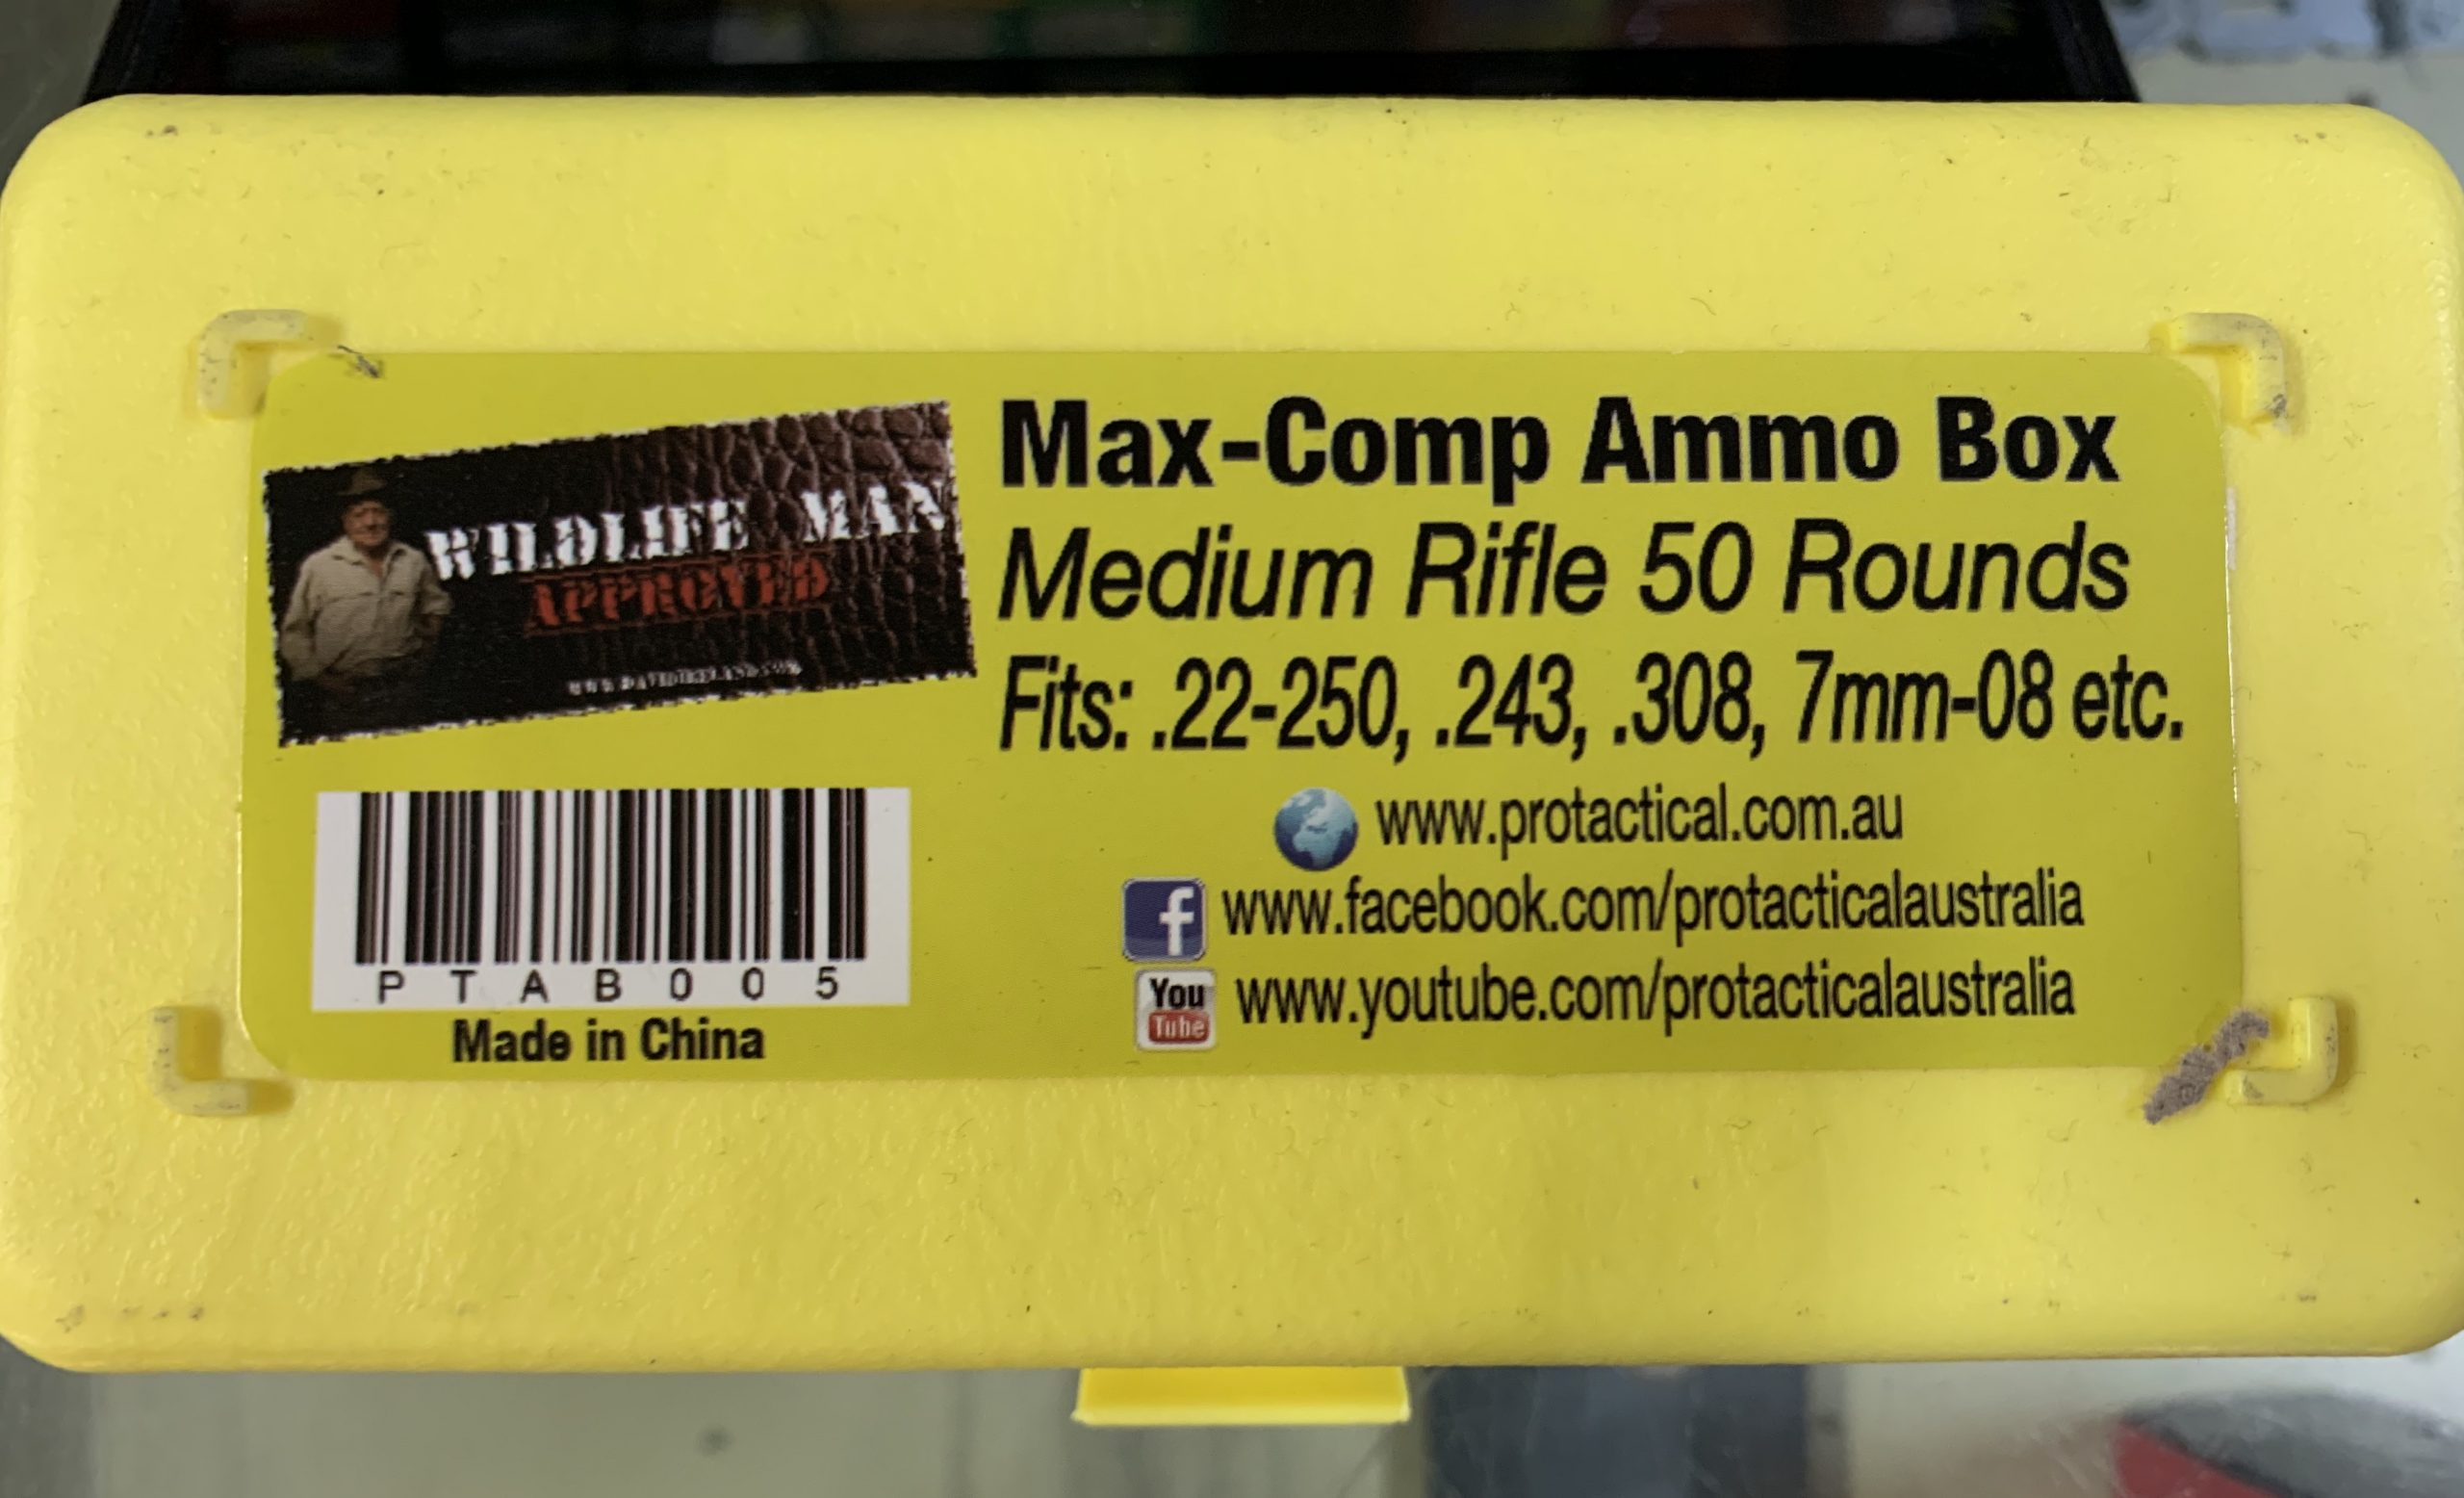 Medium rifle ammo box 22-250/243/308/7mm etc (50 capacity) MaxGuard